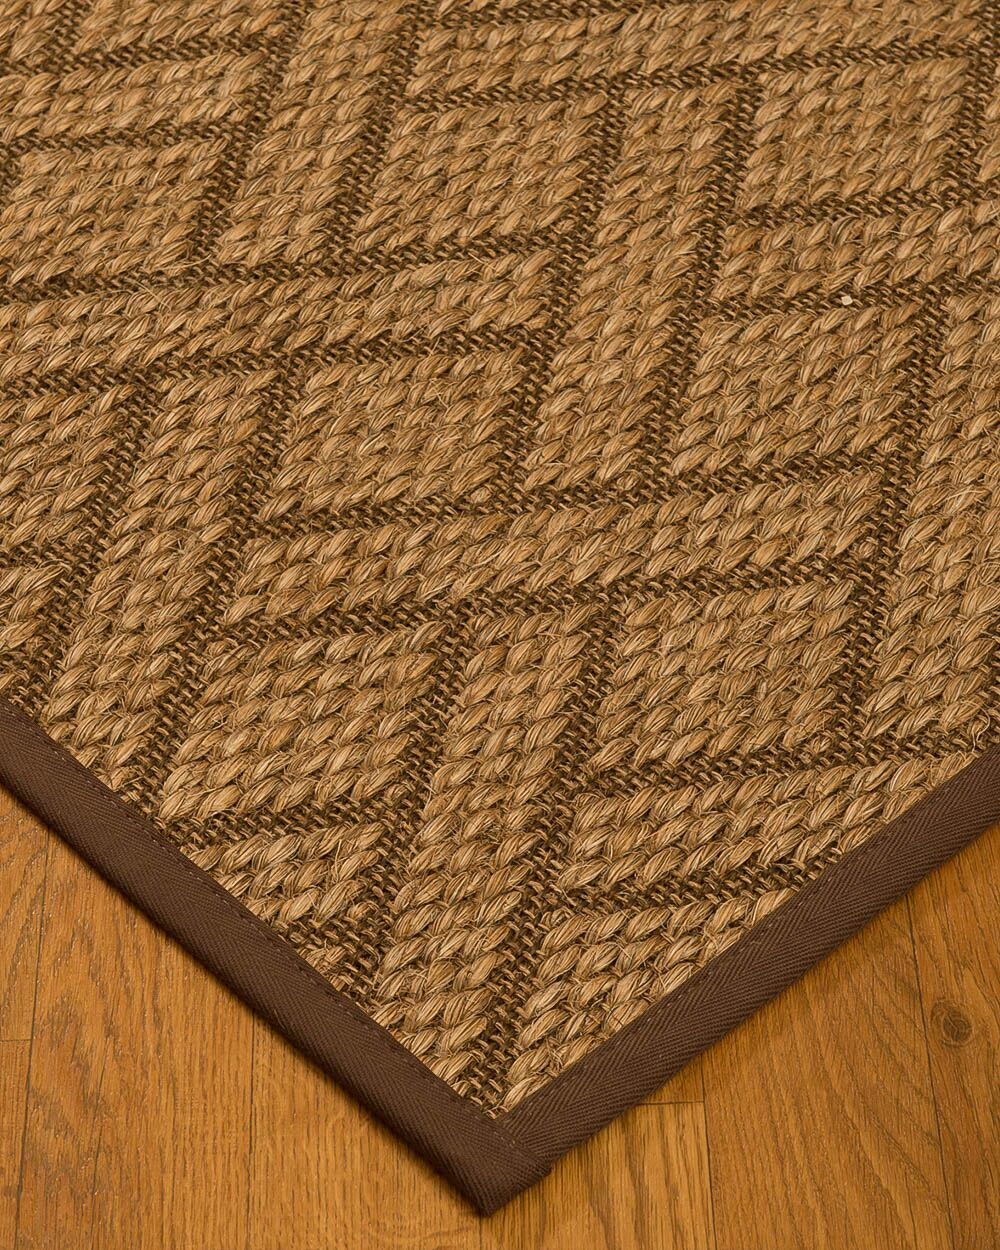 Kimbro Hand-Woven Beige Area Rug Rug Size: Rectangle 3' x 5'